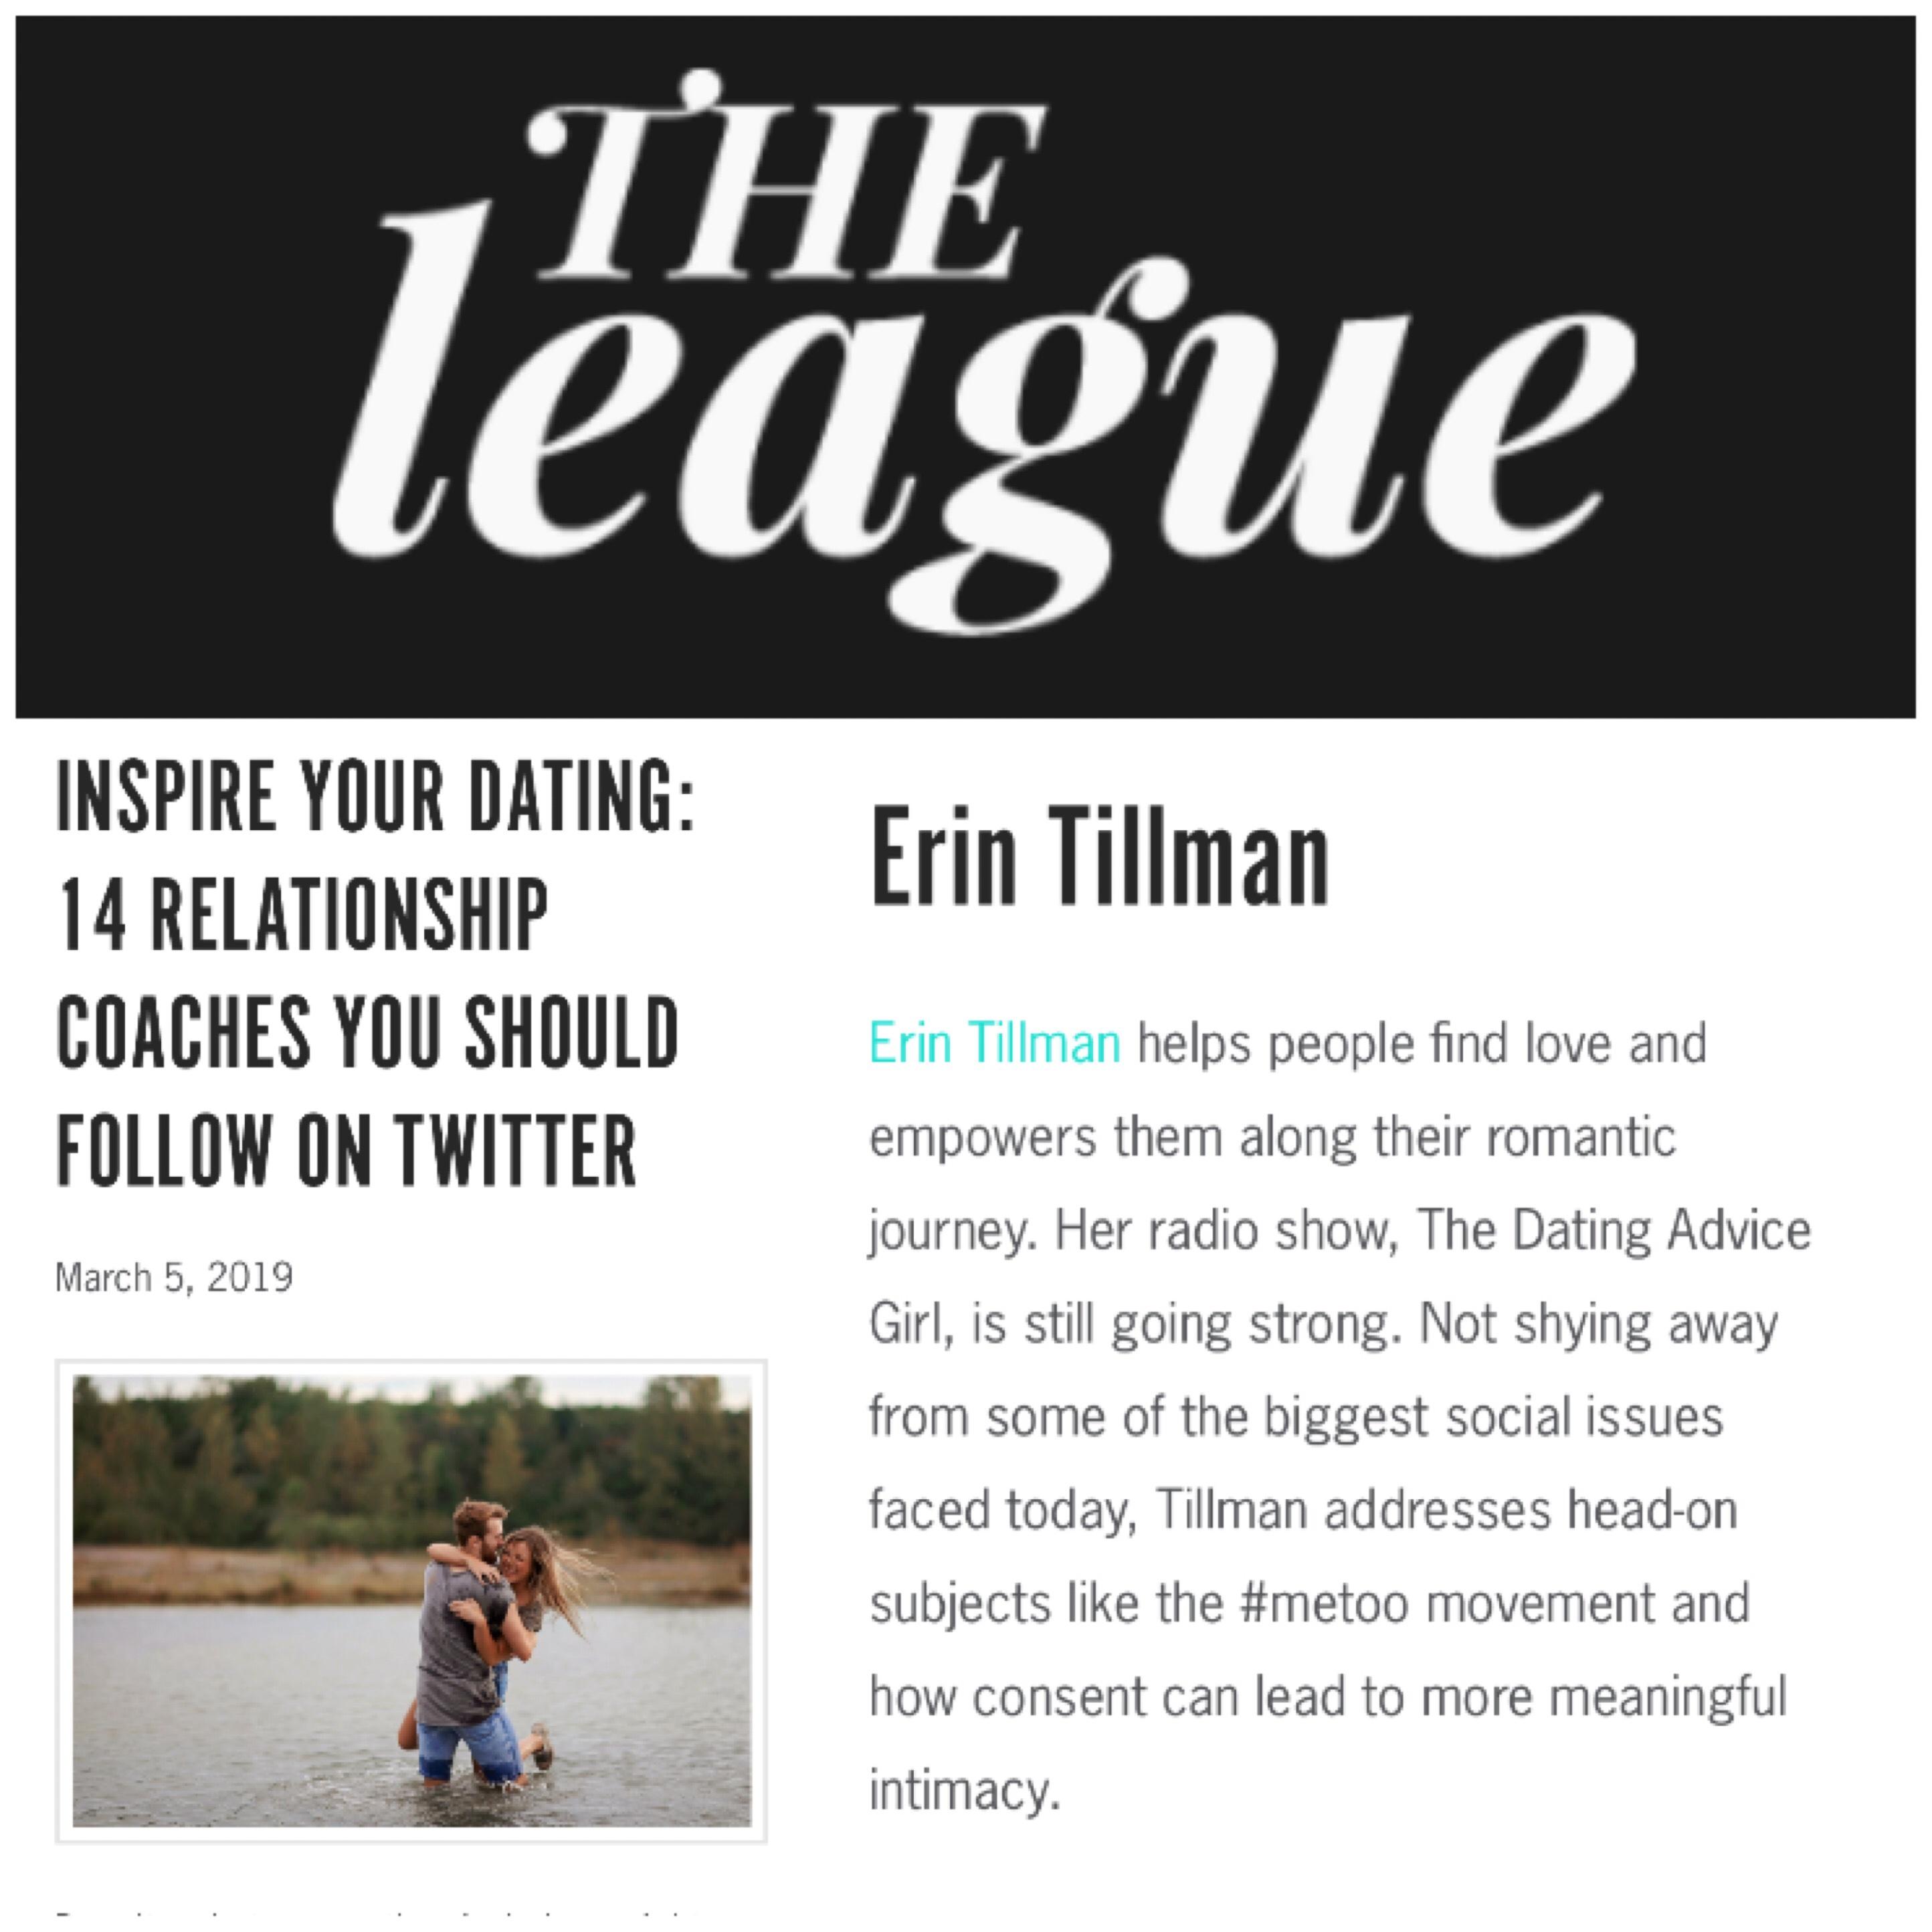 Erin tillman dating advice